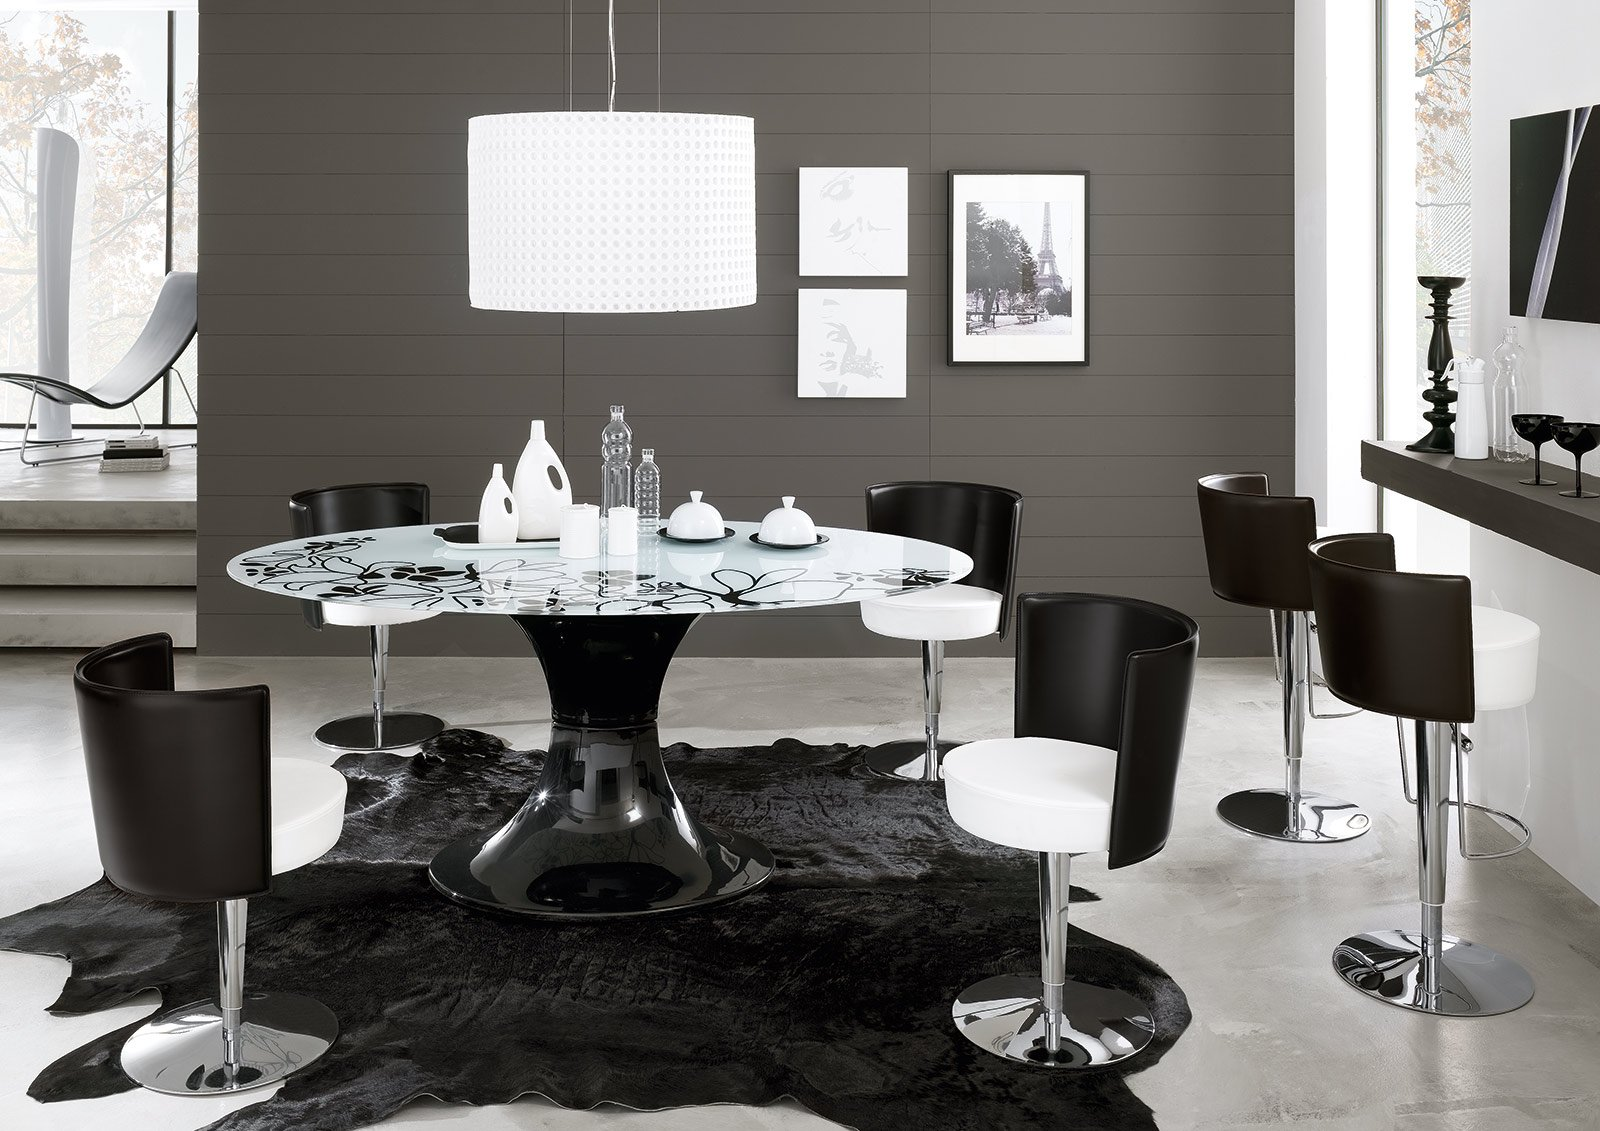 Cucine moderne bianche e nere with cucine moderne bianche for Sedie bianche e nere